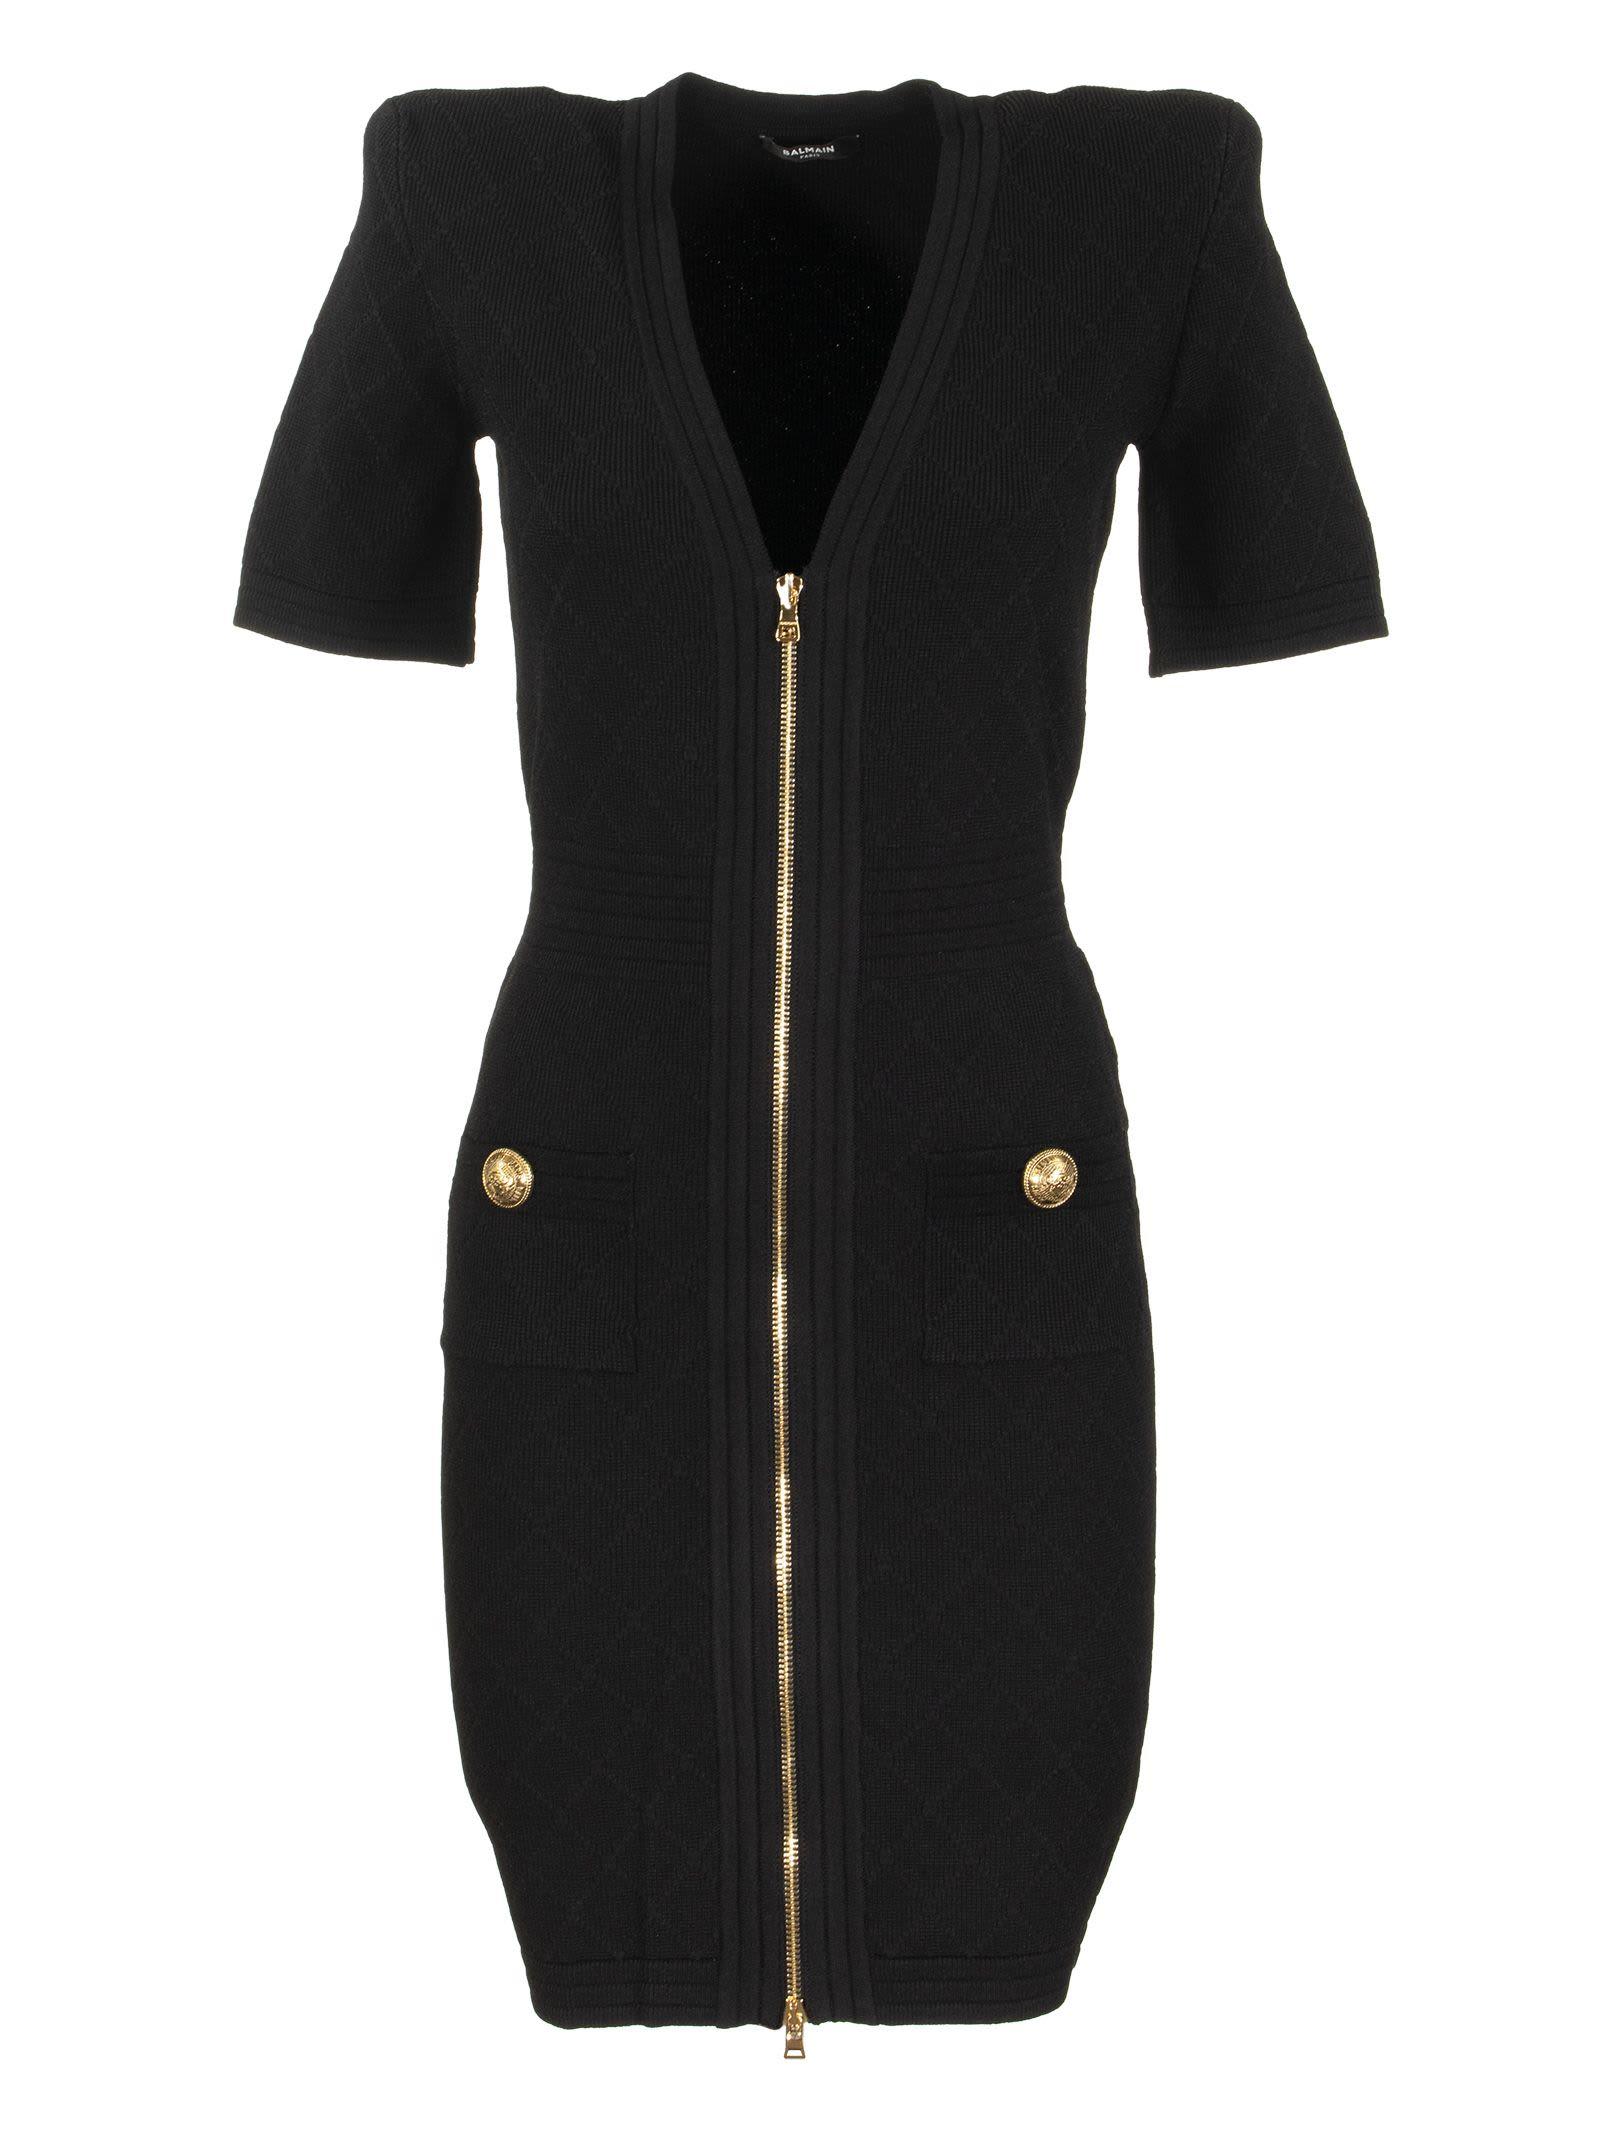 Balmain Short Black Knit Dress With Gold-tone Zip Closure